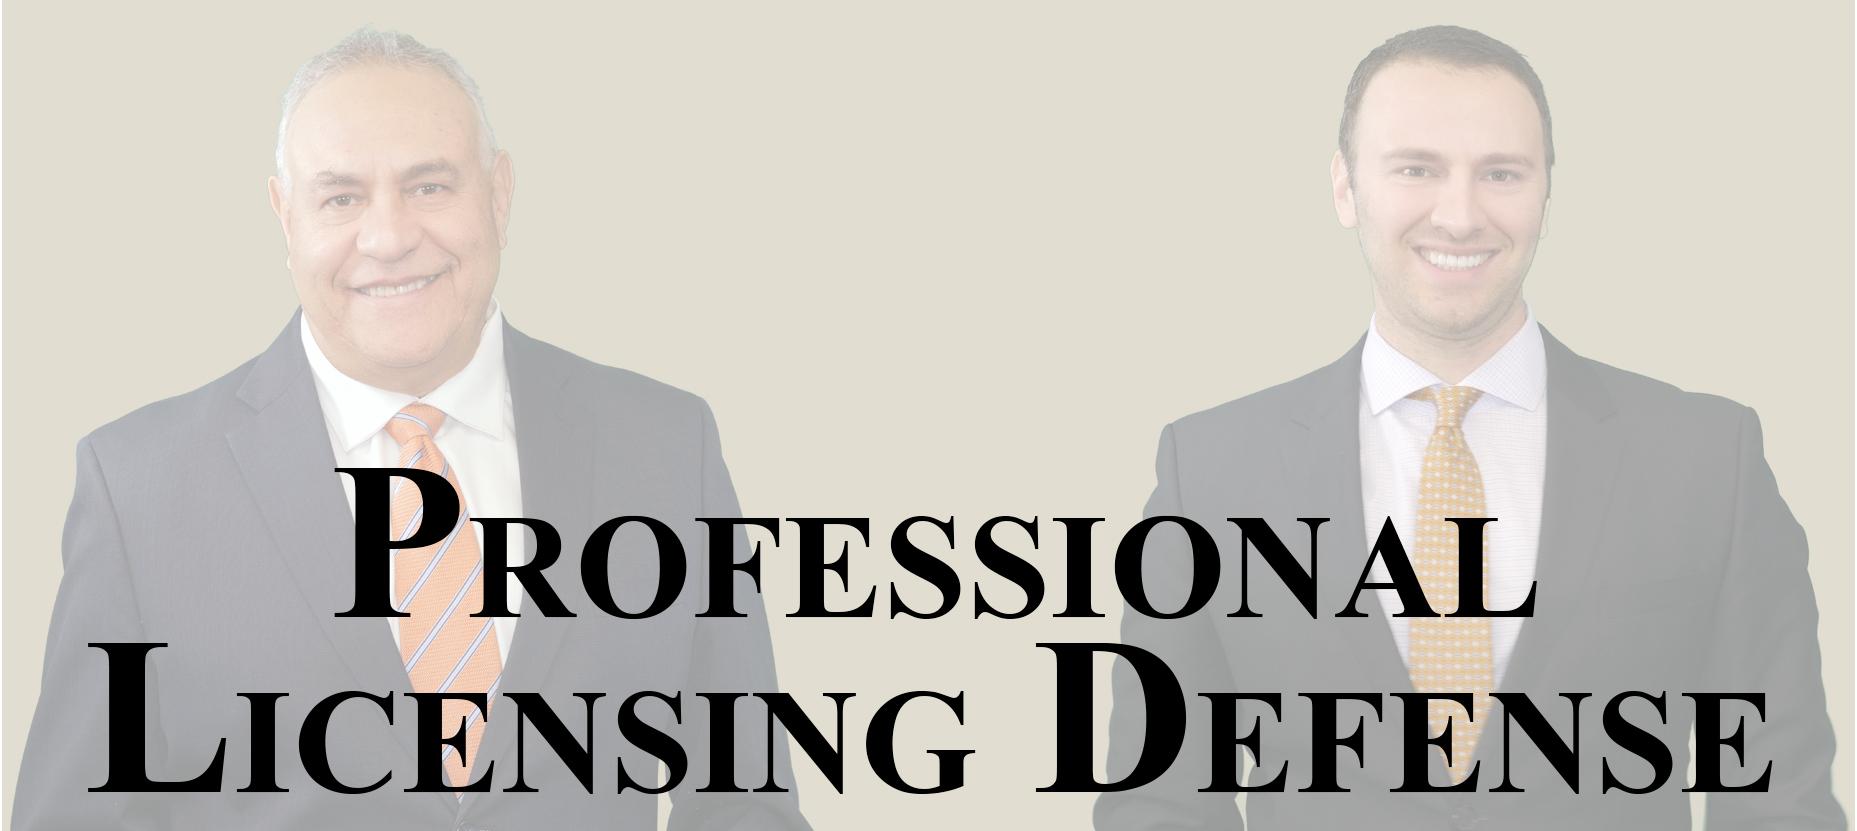 Professional Licensing Defense